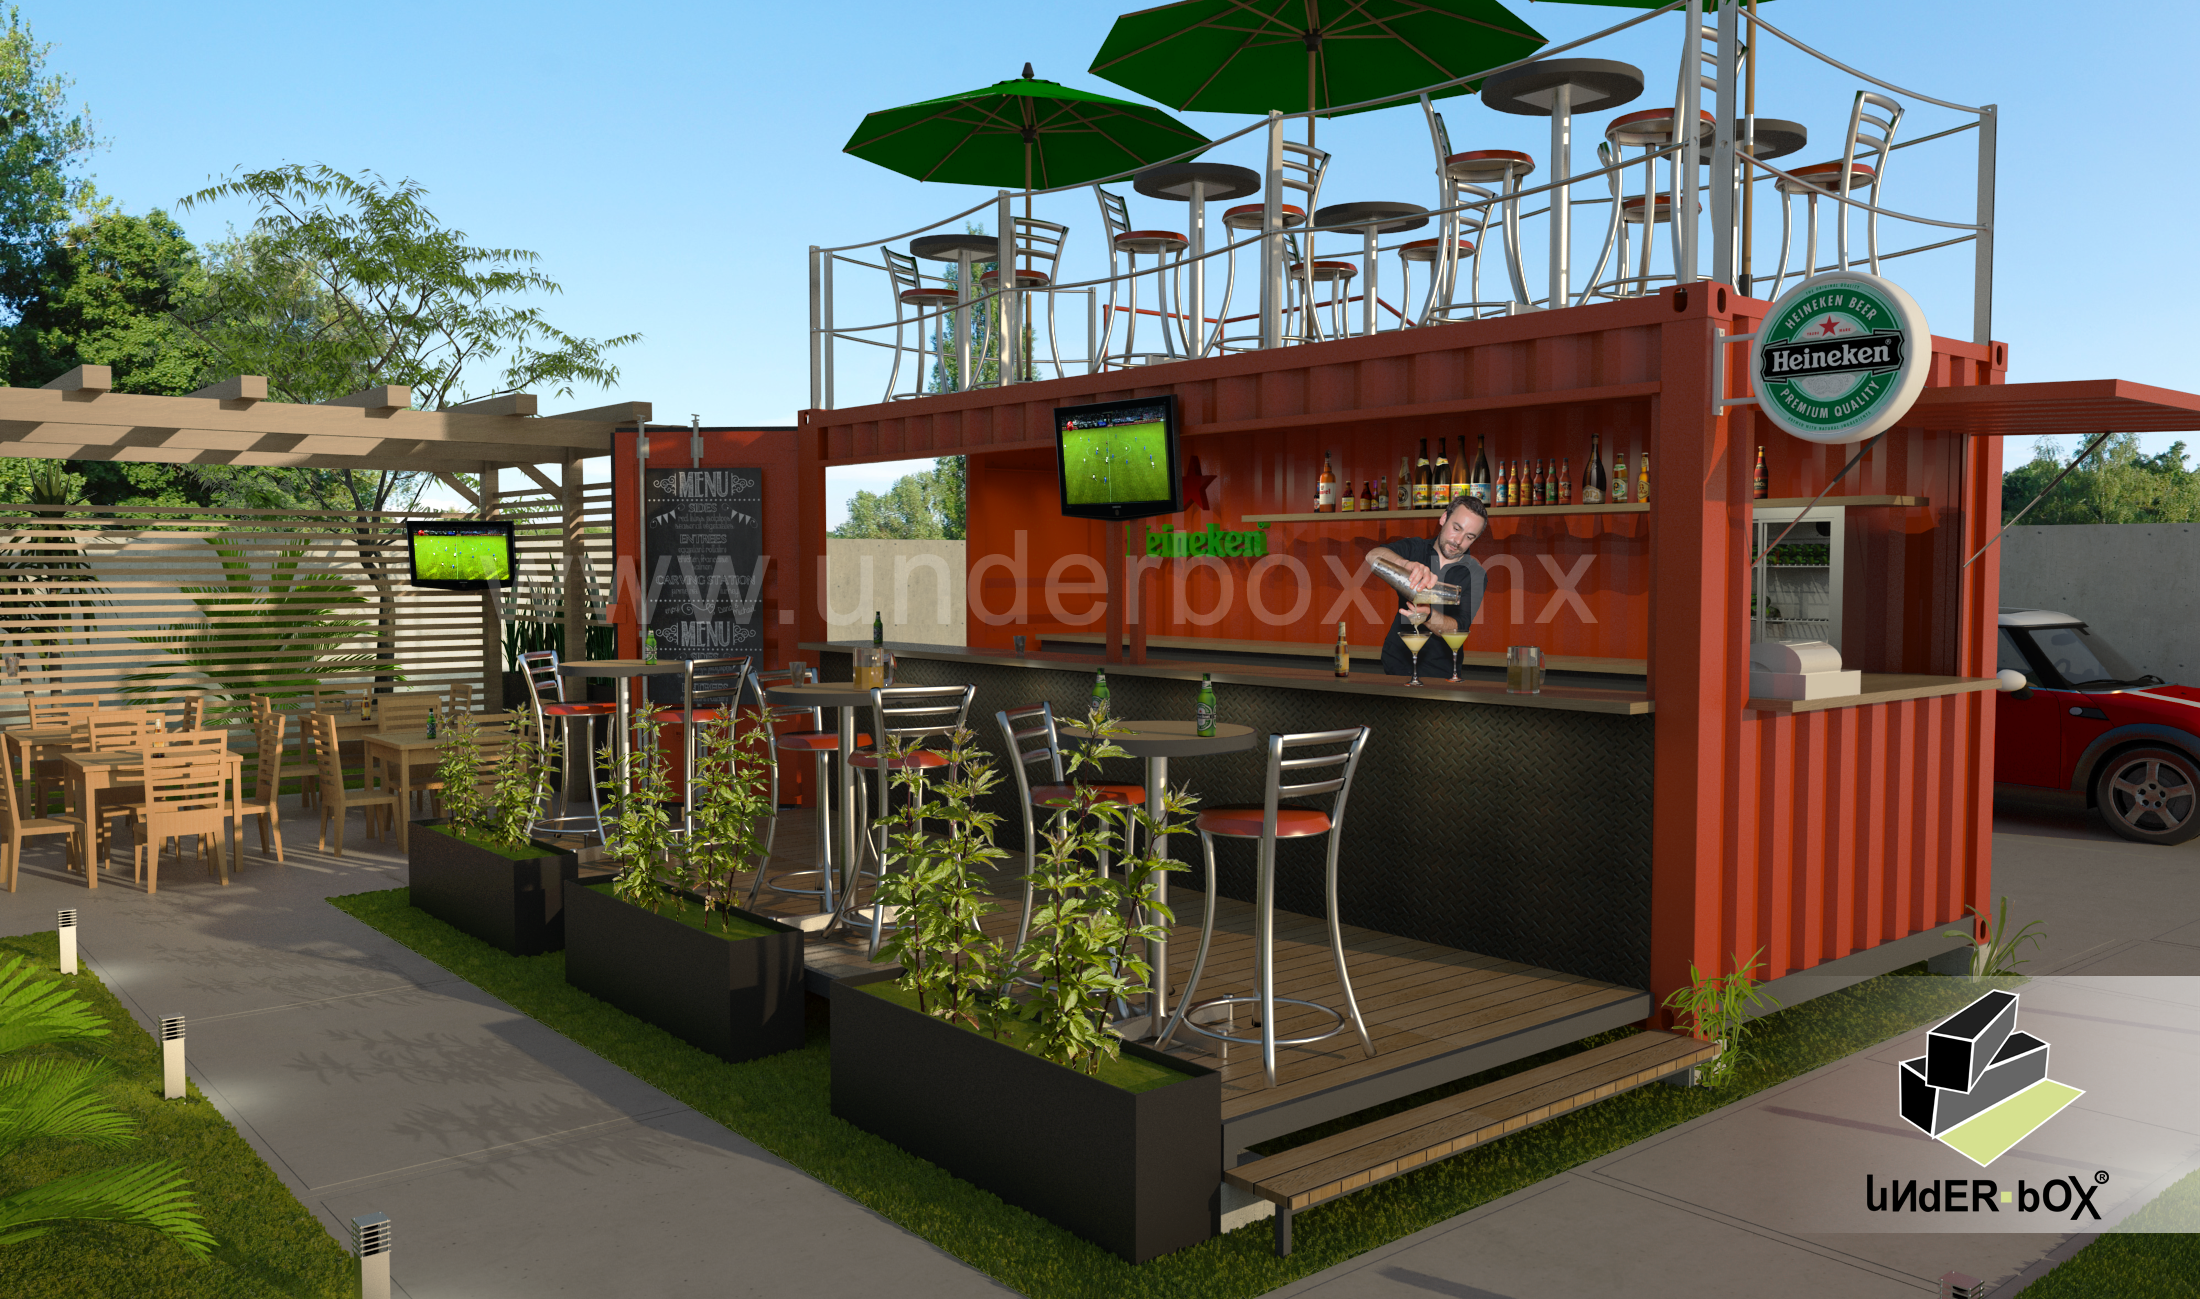 Box 01 restaurante bar terraza superior underbox for Terraza bar